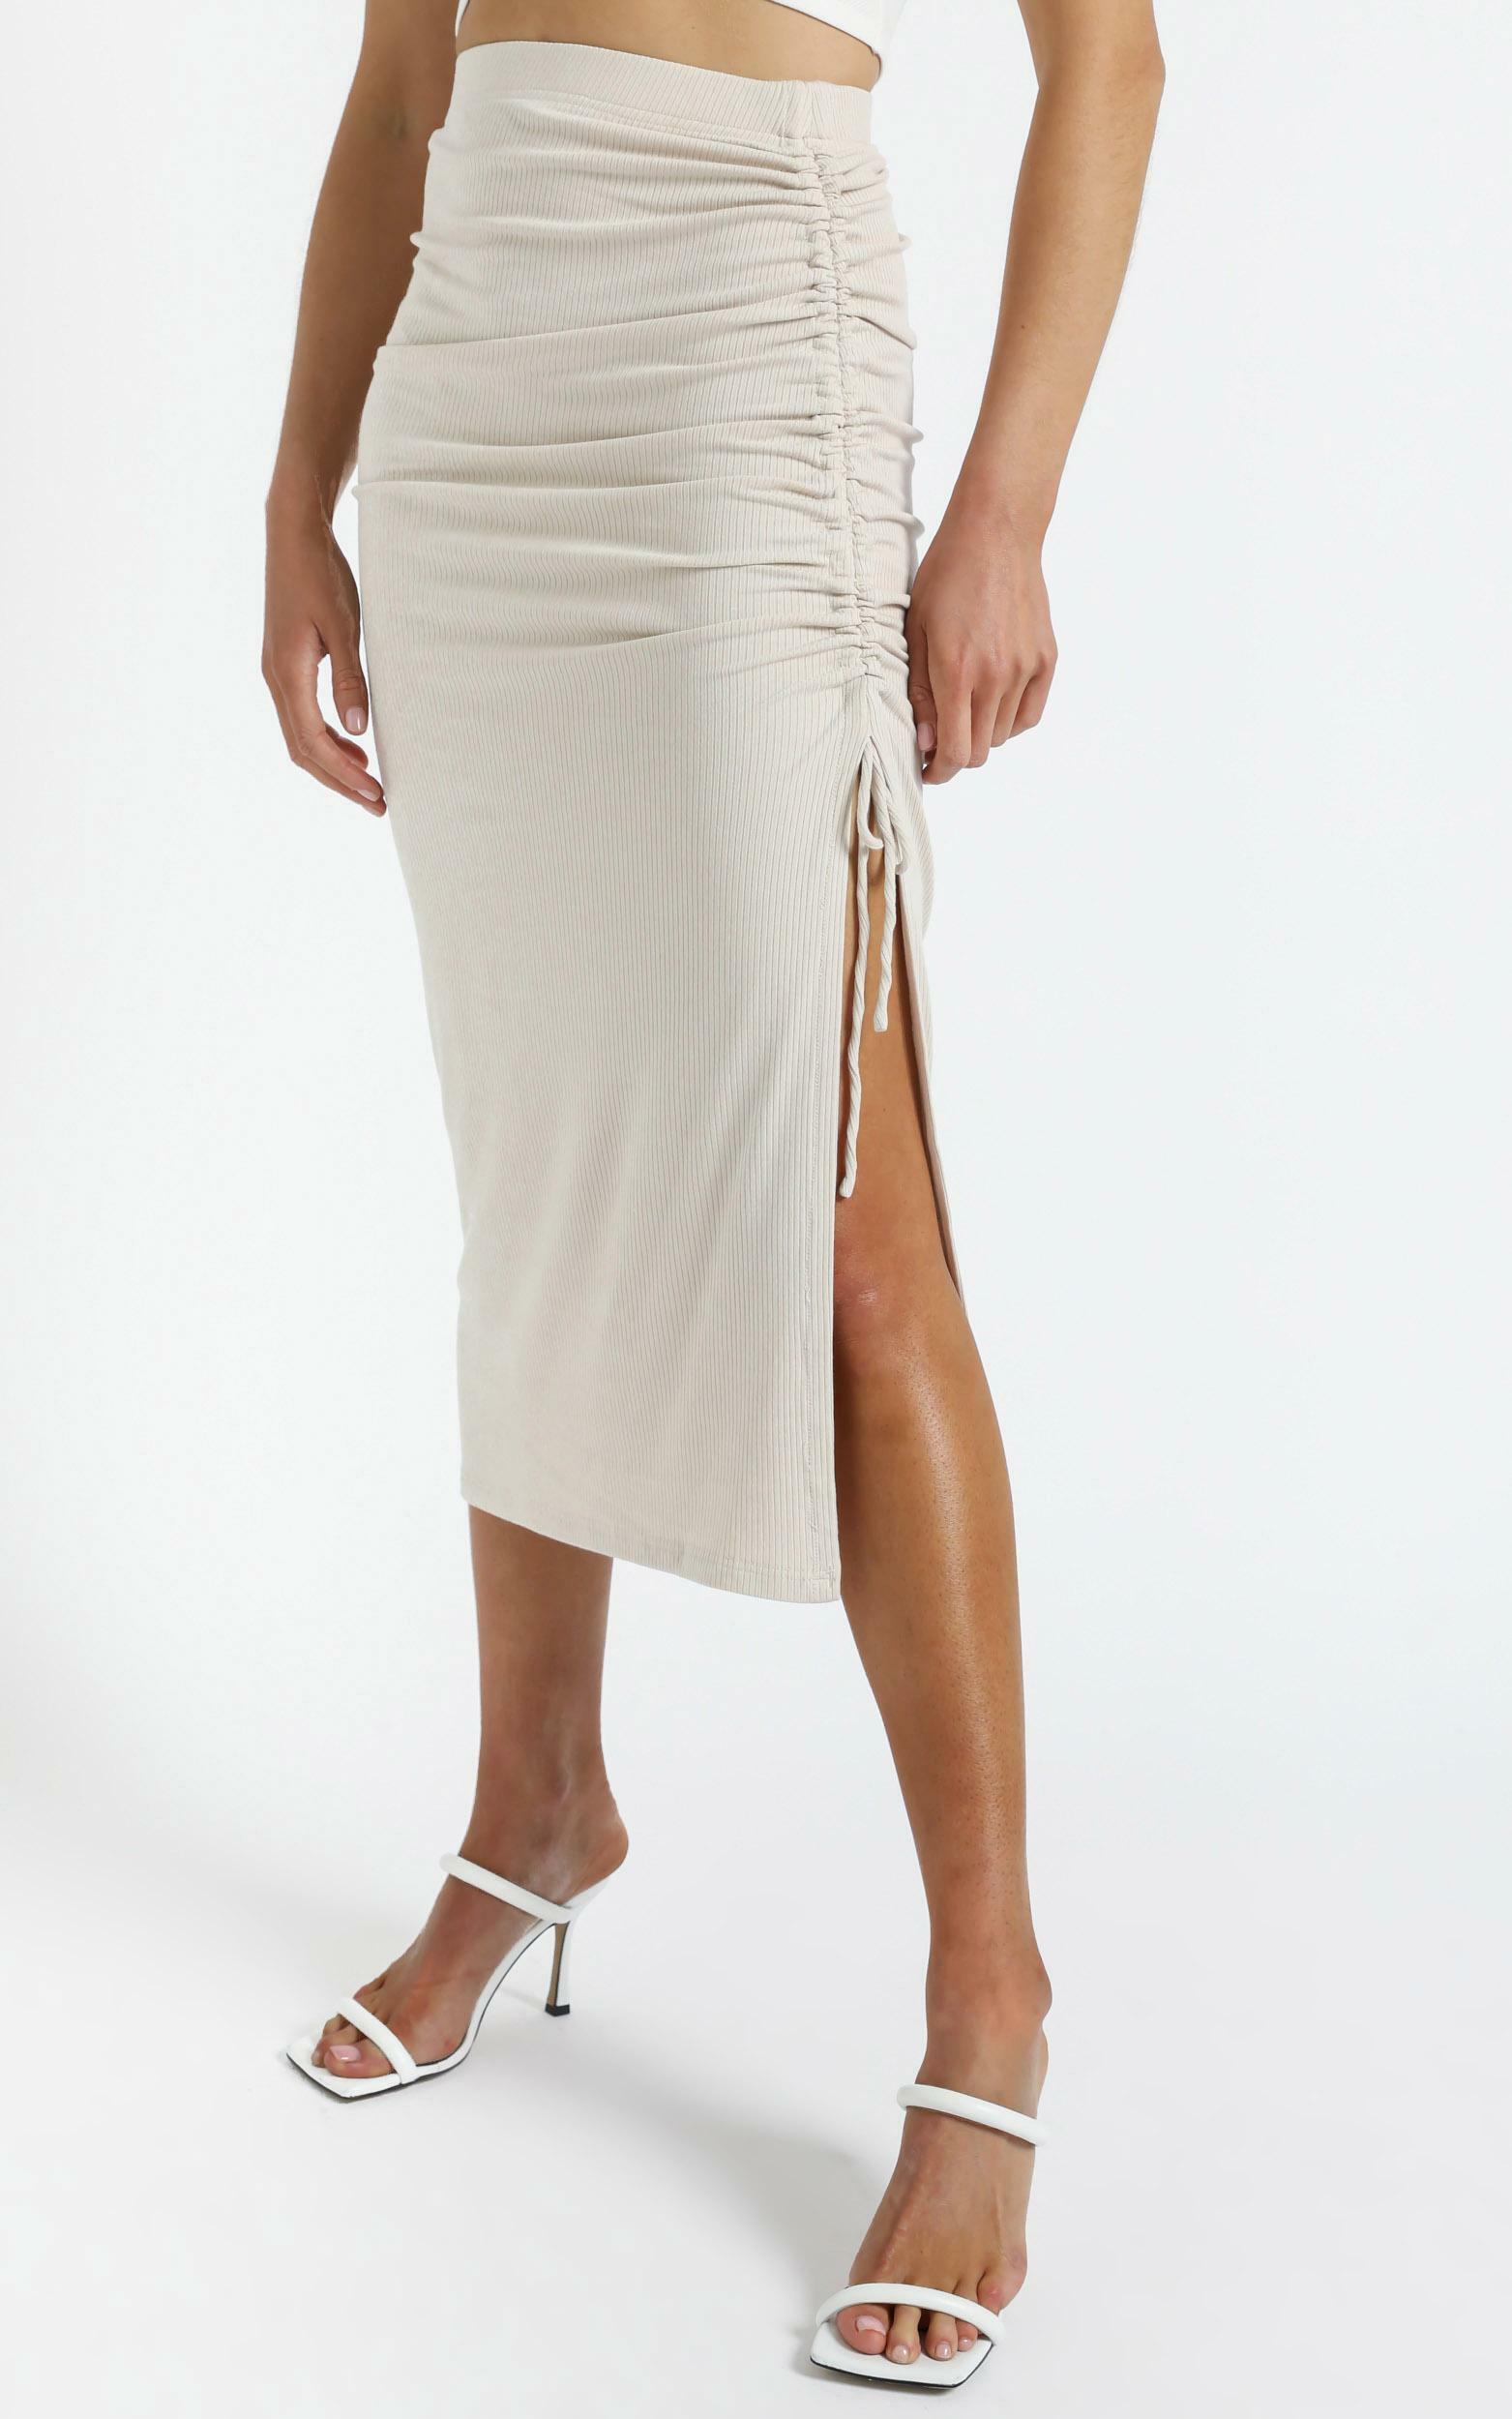 Bradford Skirt in Beige - 14 (XL), Beige, hi-res image number null